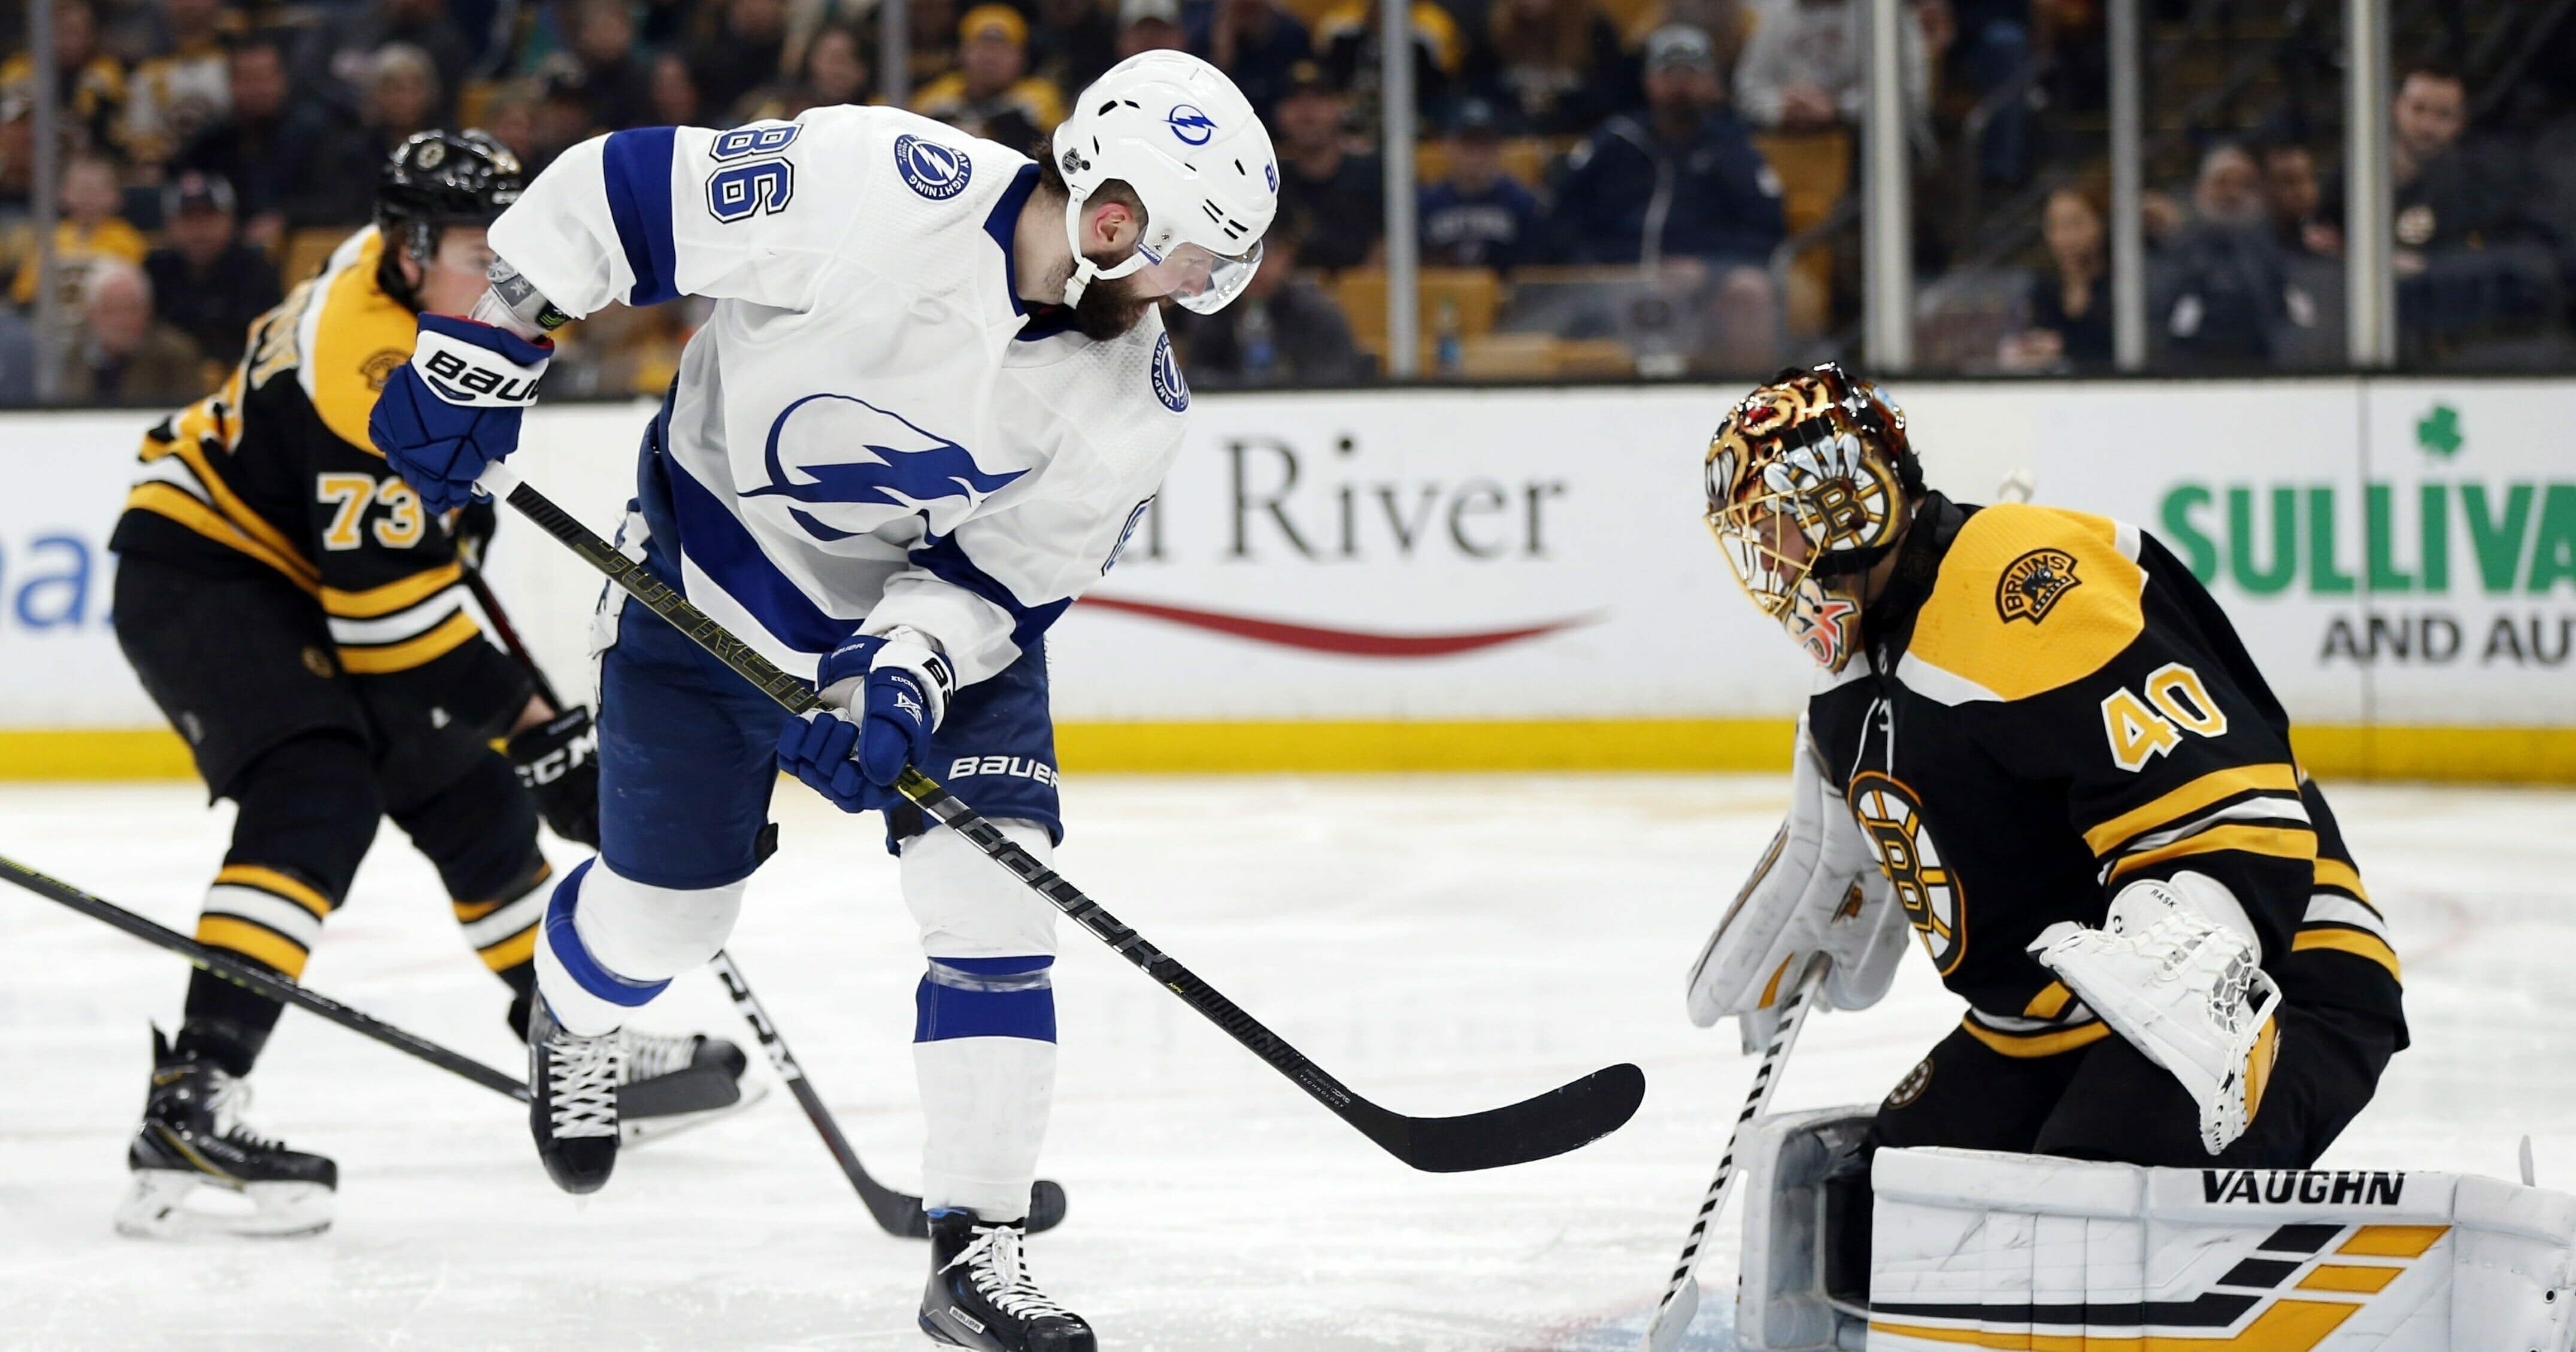 Tampa Bay Lightning's Nikita Kucherov scores on Boston Bruins' Tuukka Rask during the third period of an NHL hockey game in Boston, Saturday, April 6, 2019.